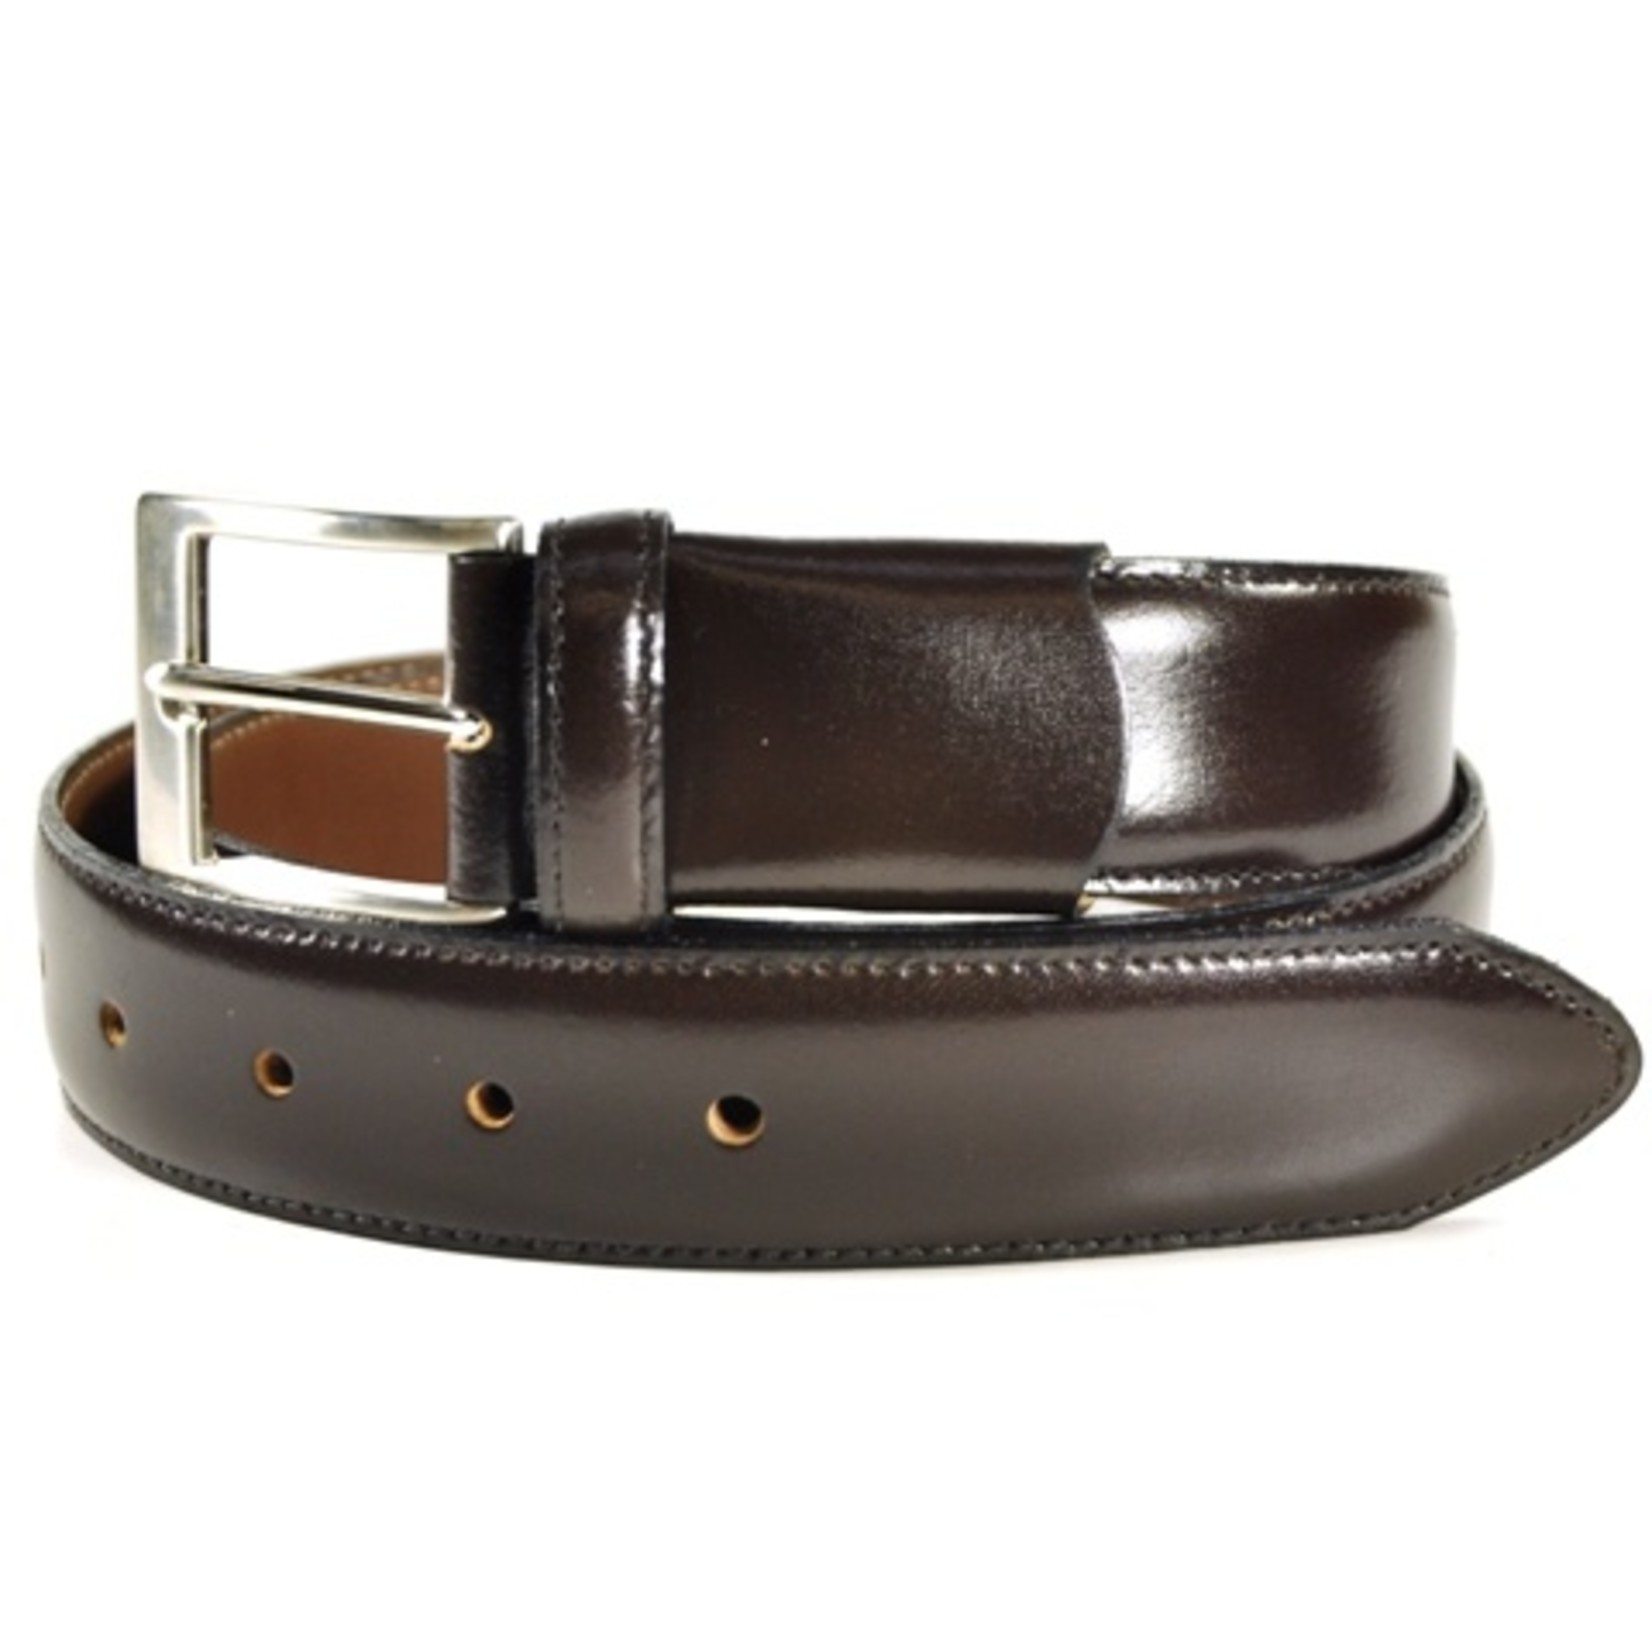 Benchcraft Bench Craft 3536-E Comfort Belt